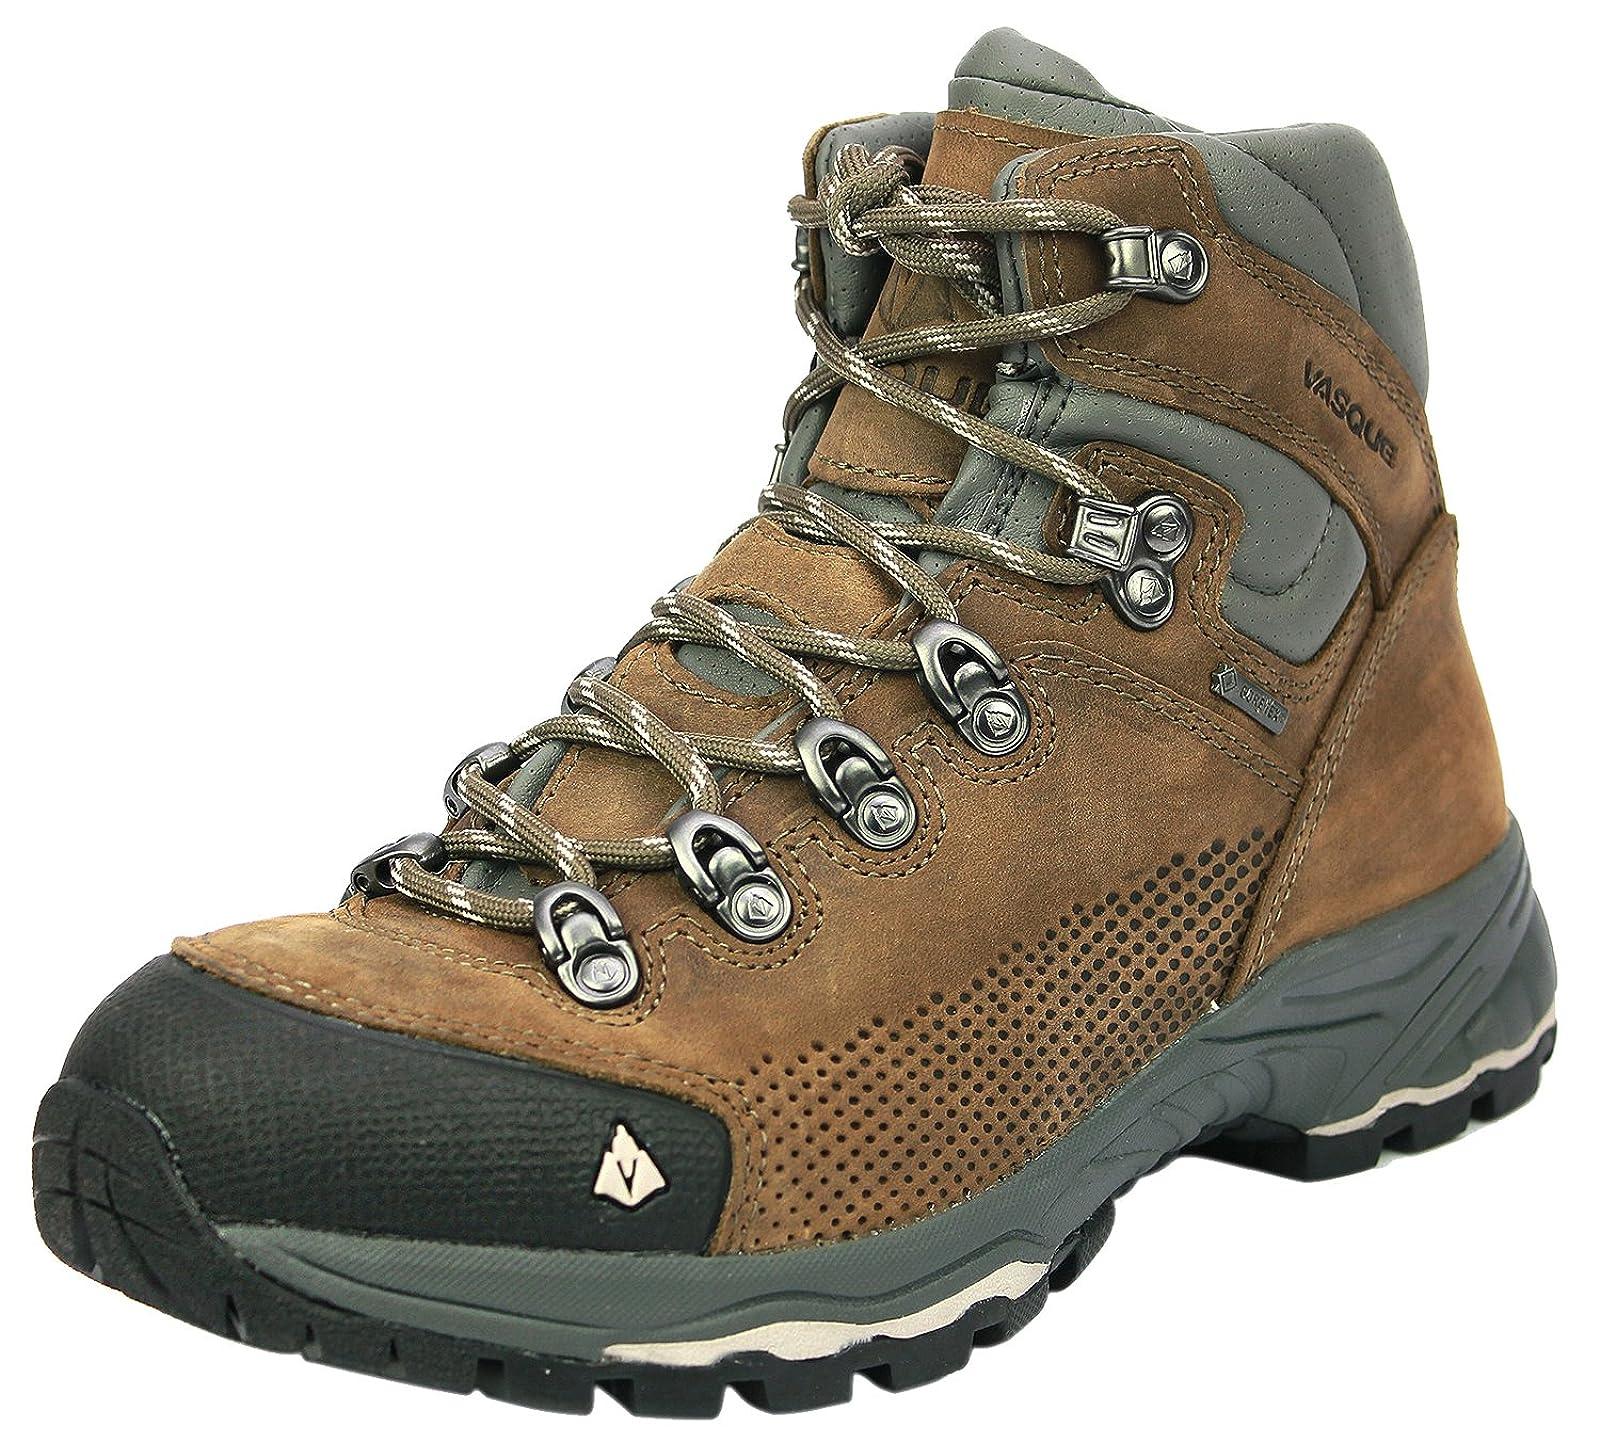 Vasque Women's St. Elias Gore-Tex Hiking Boot 8 M US Women - 1